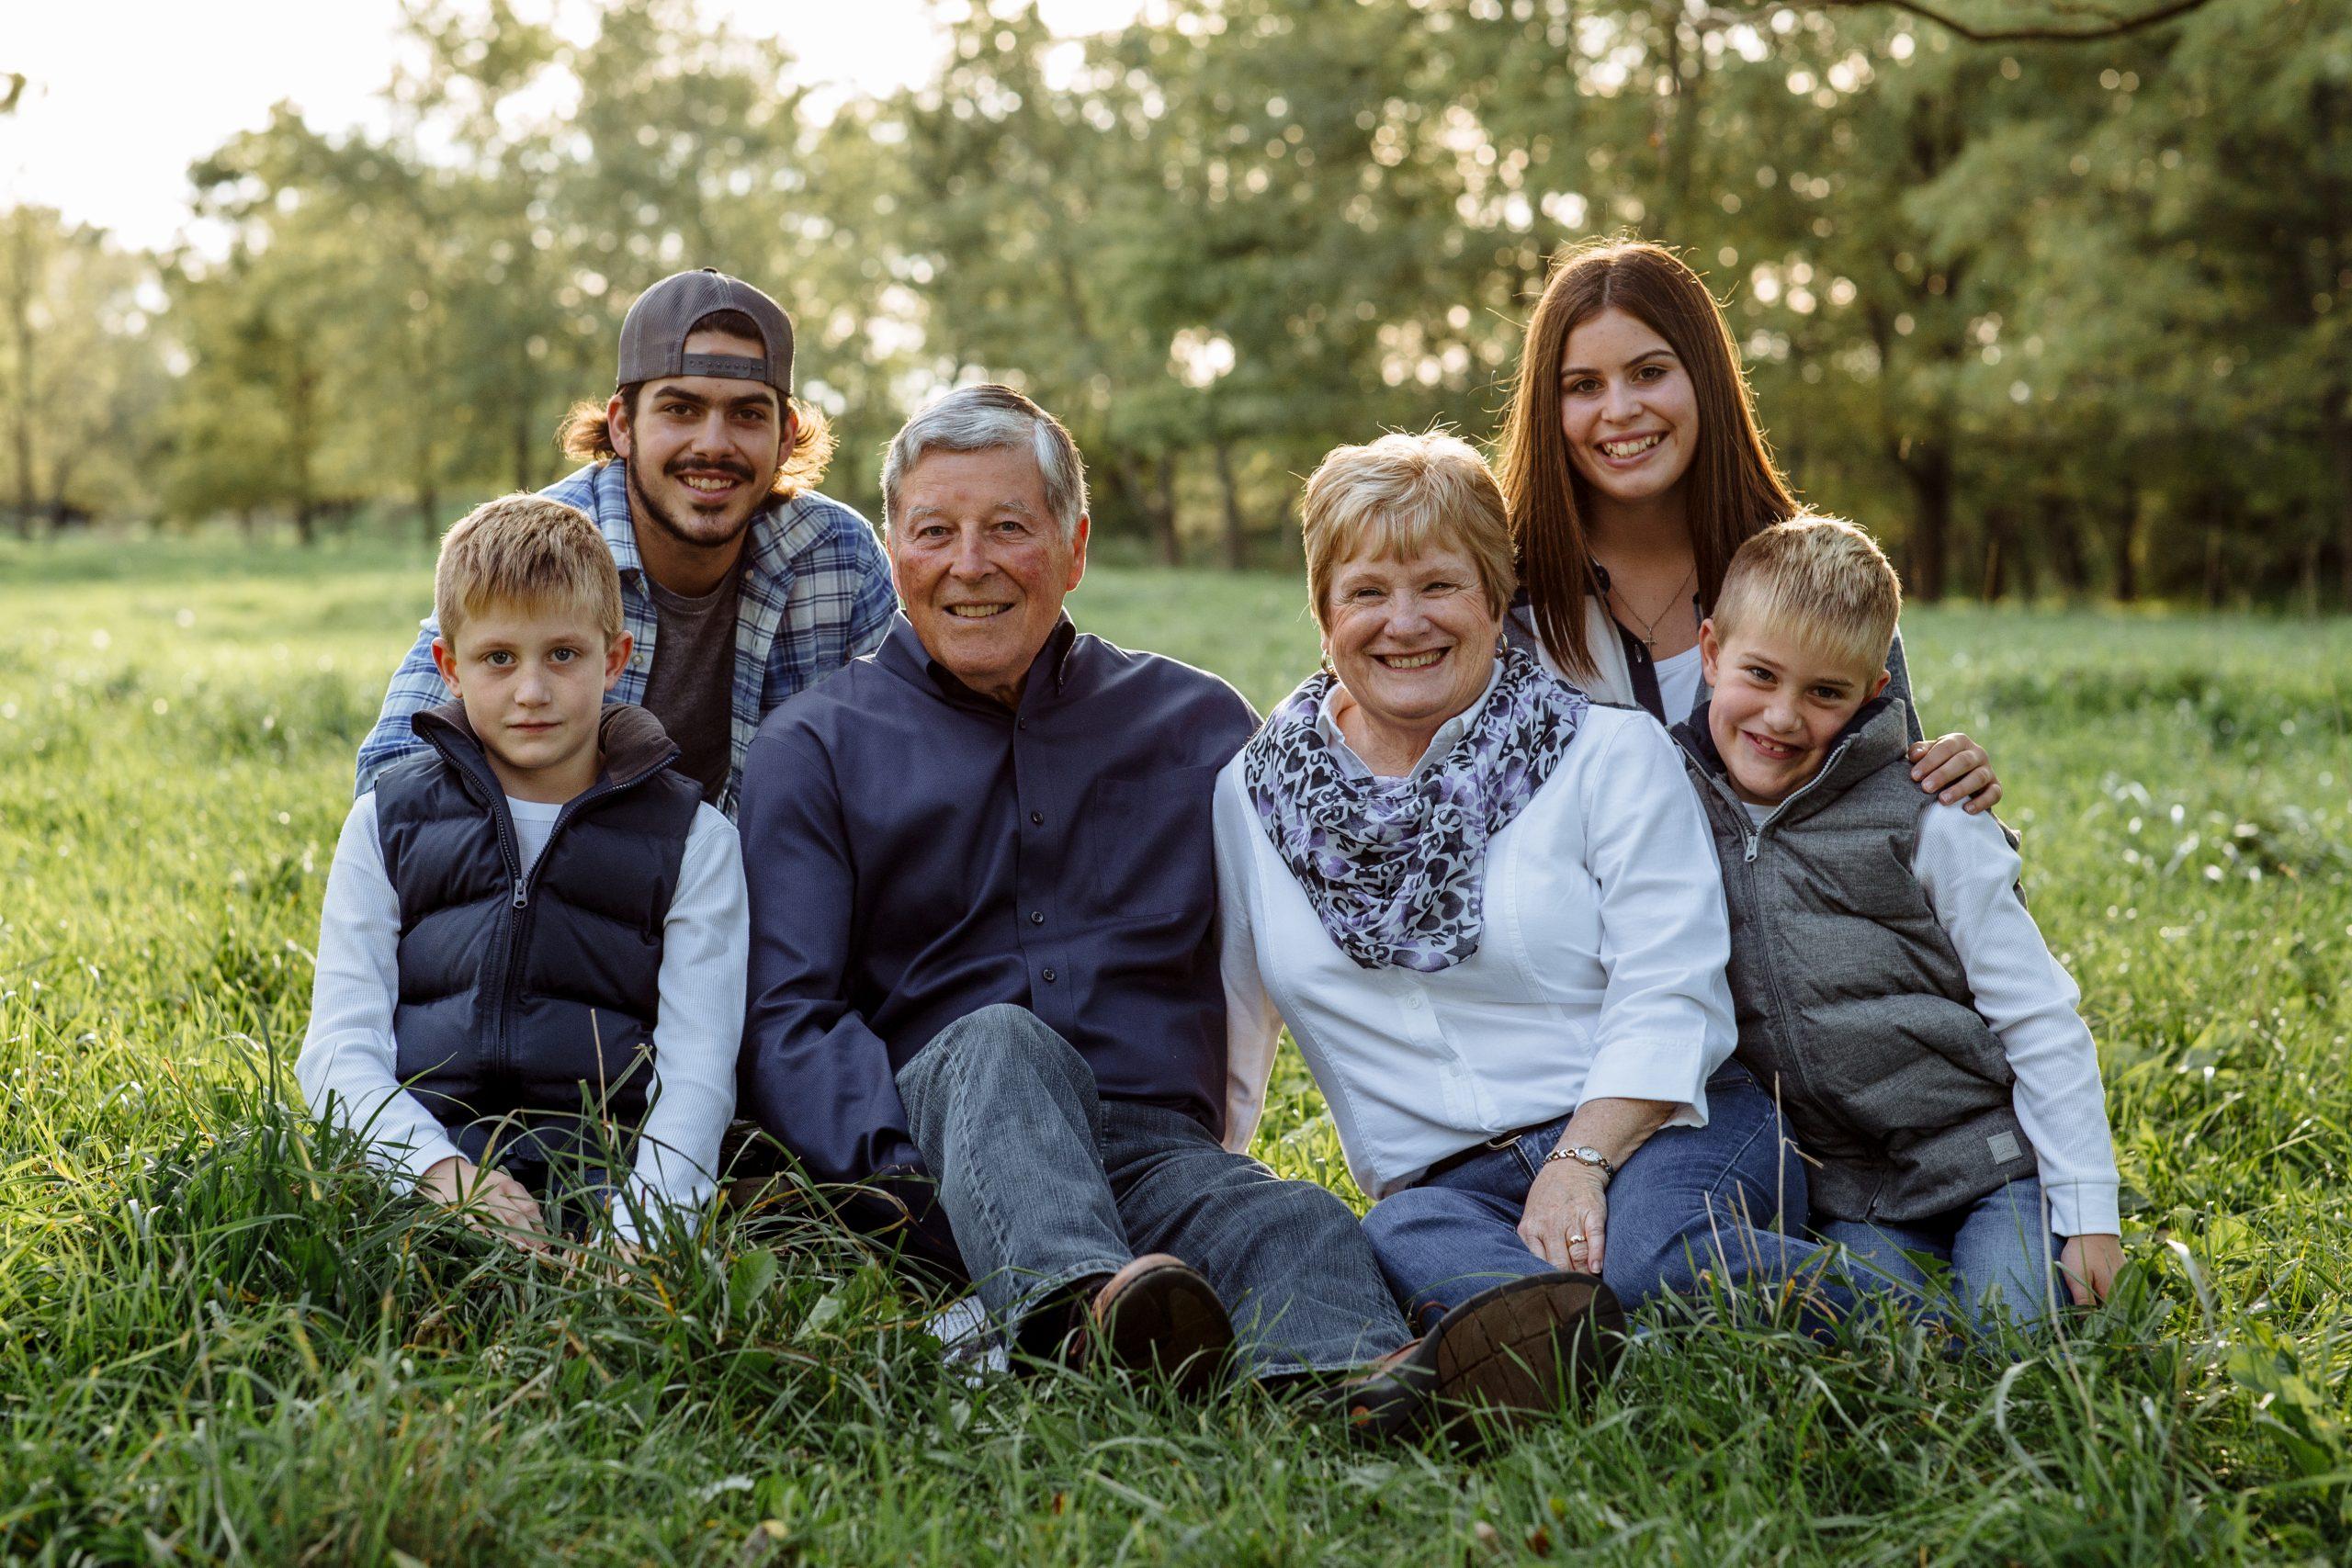 Venue - Bloomers Family Farm